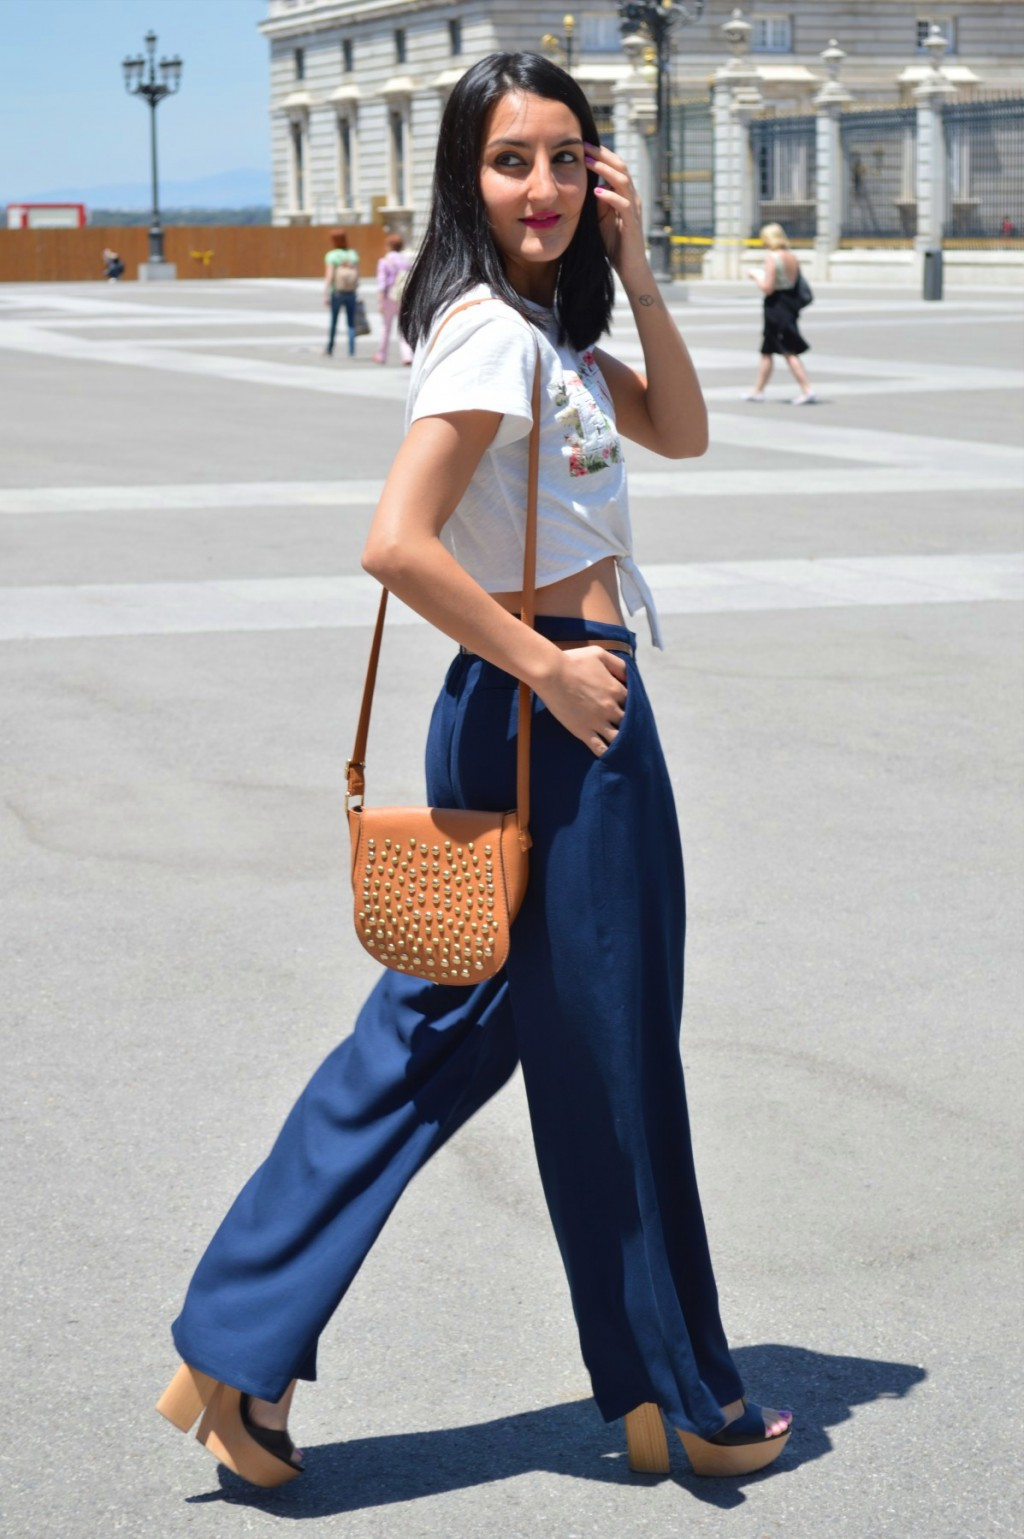 Cazadora vaquera / denim jacket: United Colors of Benetton Top: Lefties (new) Pantalones palazzo / palazzo pants: Mango (old) Zapatos / shoes: Zara (old) Cinturón / belt: Sfera Bolso / bag: Primark